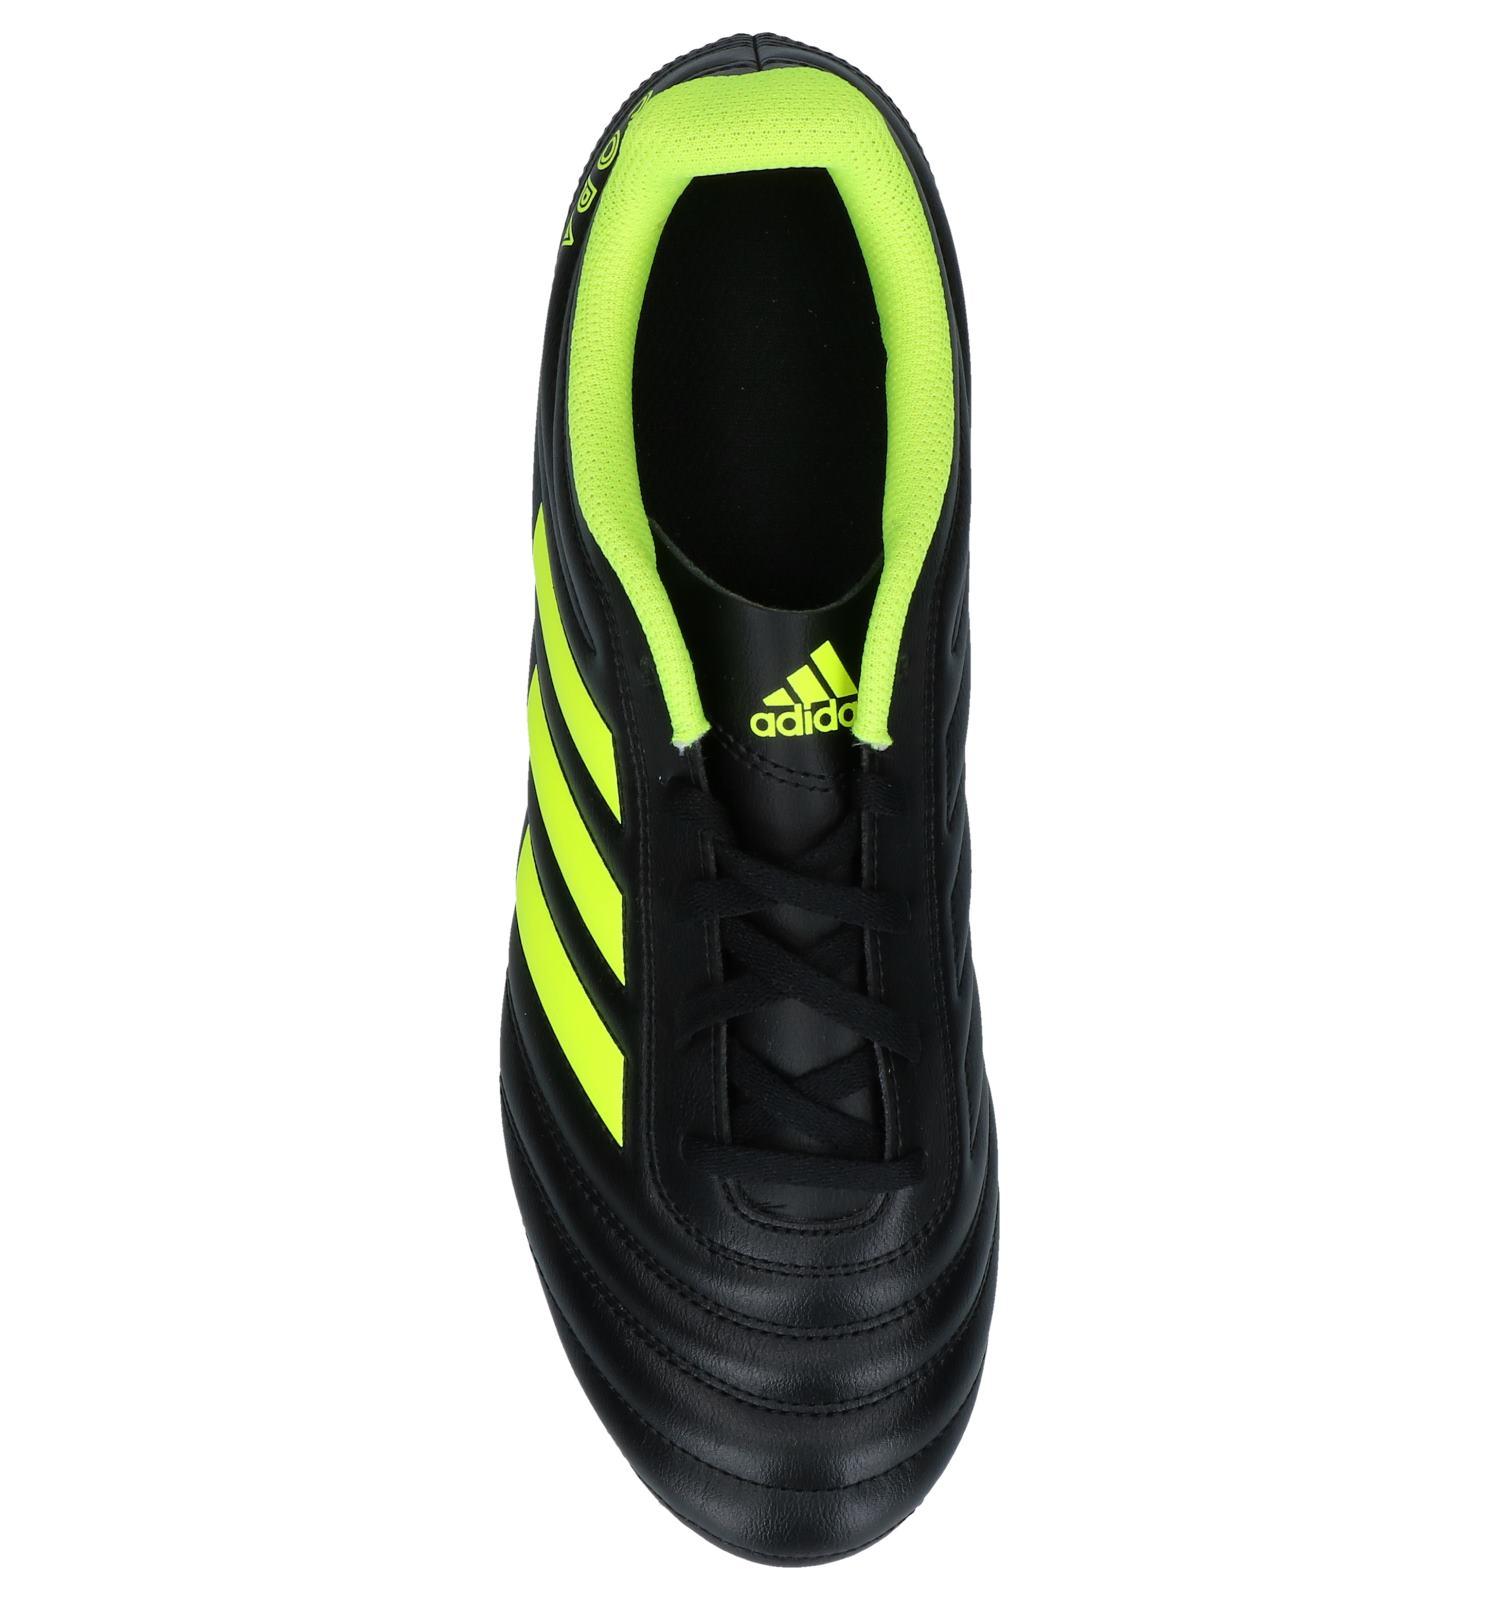 46e313f0af1 Zwarte Voetbalschoenen adidas Copa 19.4 FG | TORFS.BE | Gratis verzend en  retour